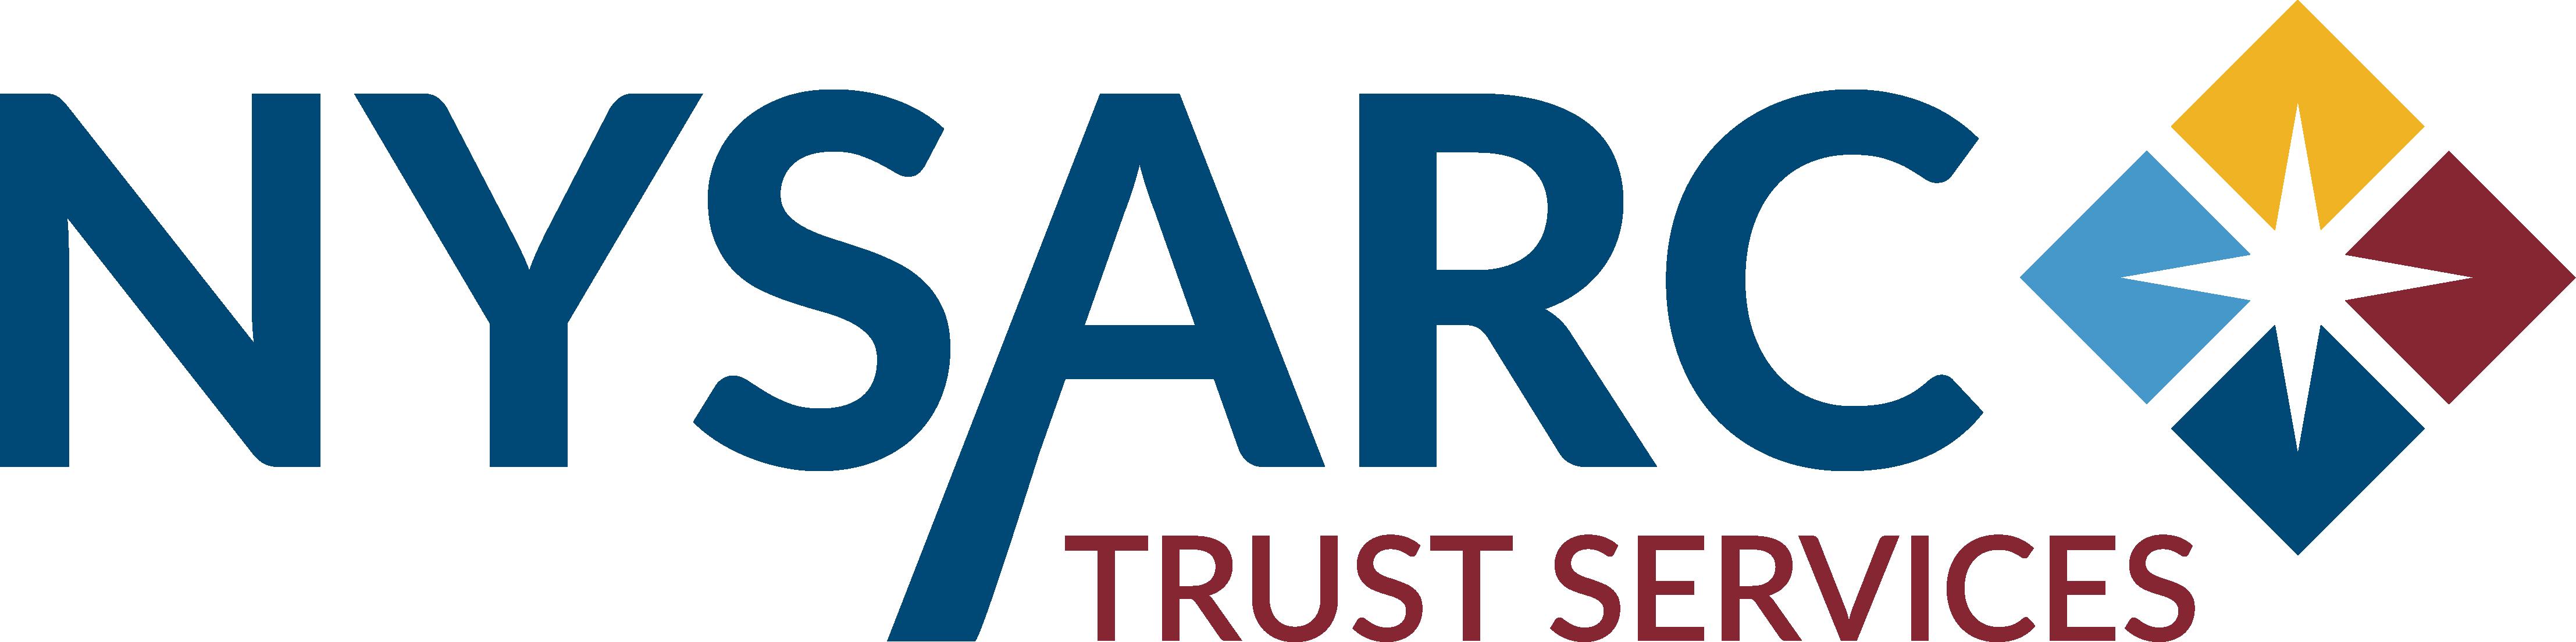 NYSARC Trust Services